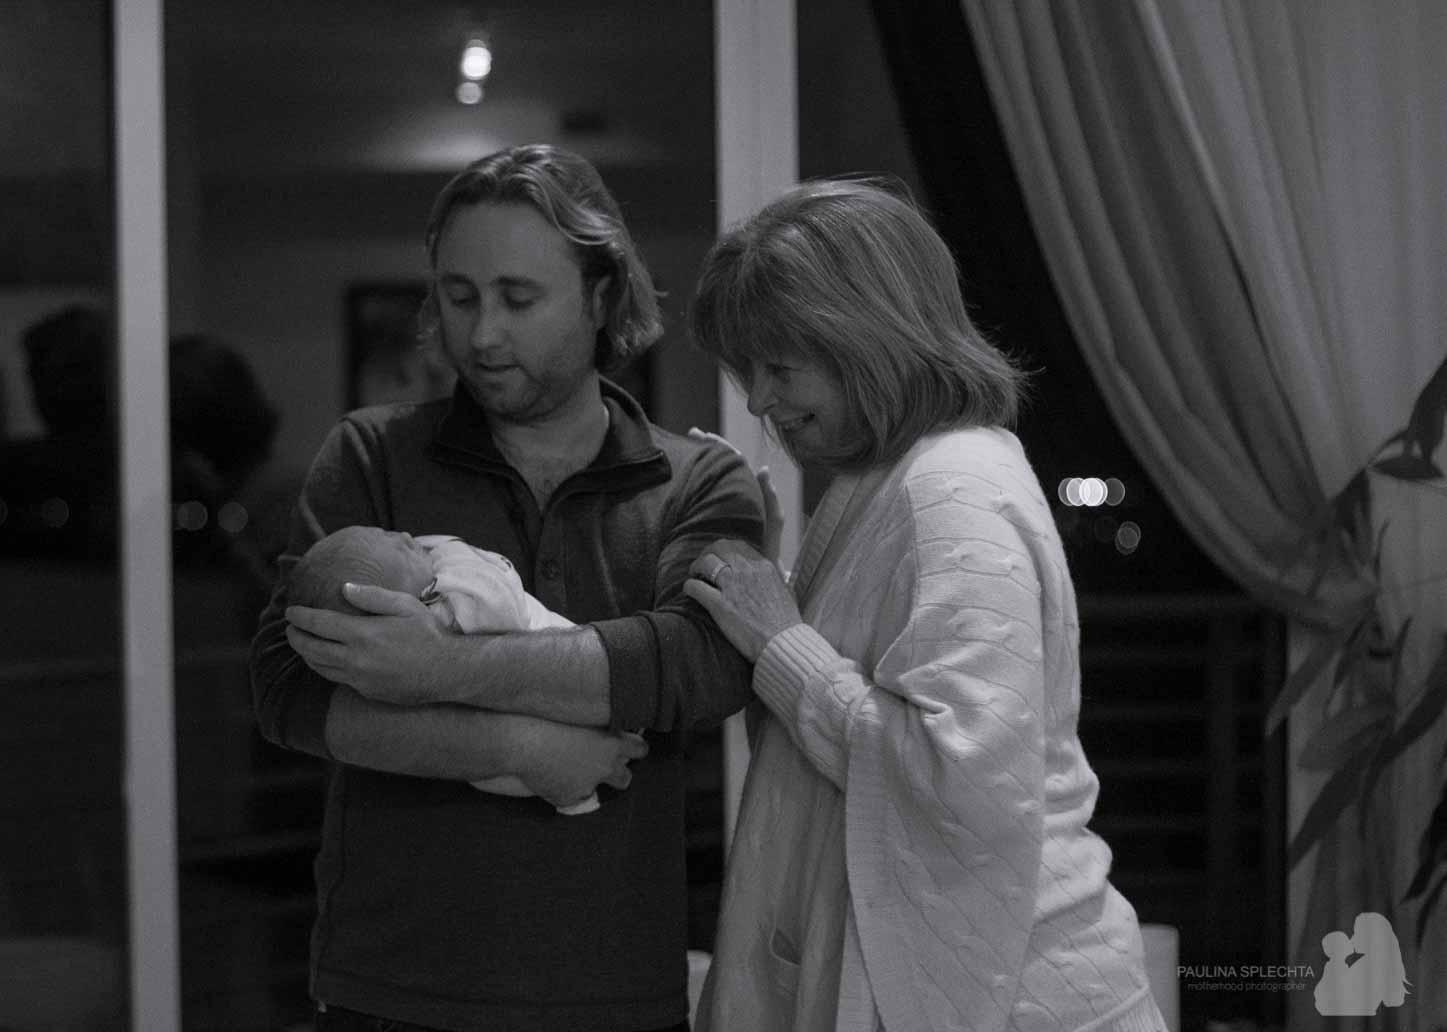 birth-photographer-boca-photography-near-me-birth-center-delray-beach-hollywood-breastfeeding-doula-midwife-childbirth-32.jpg